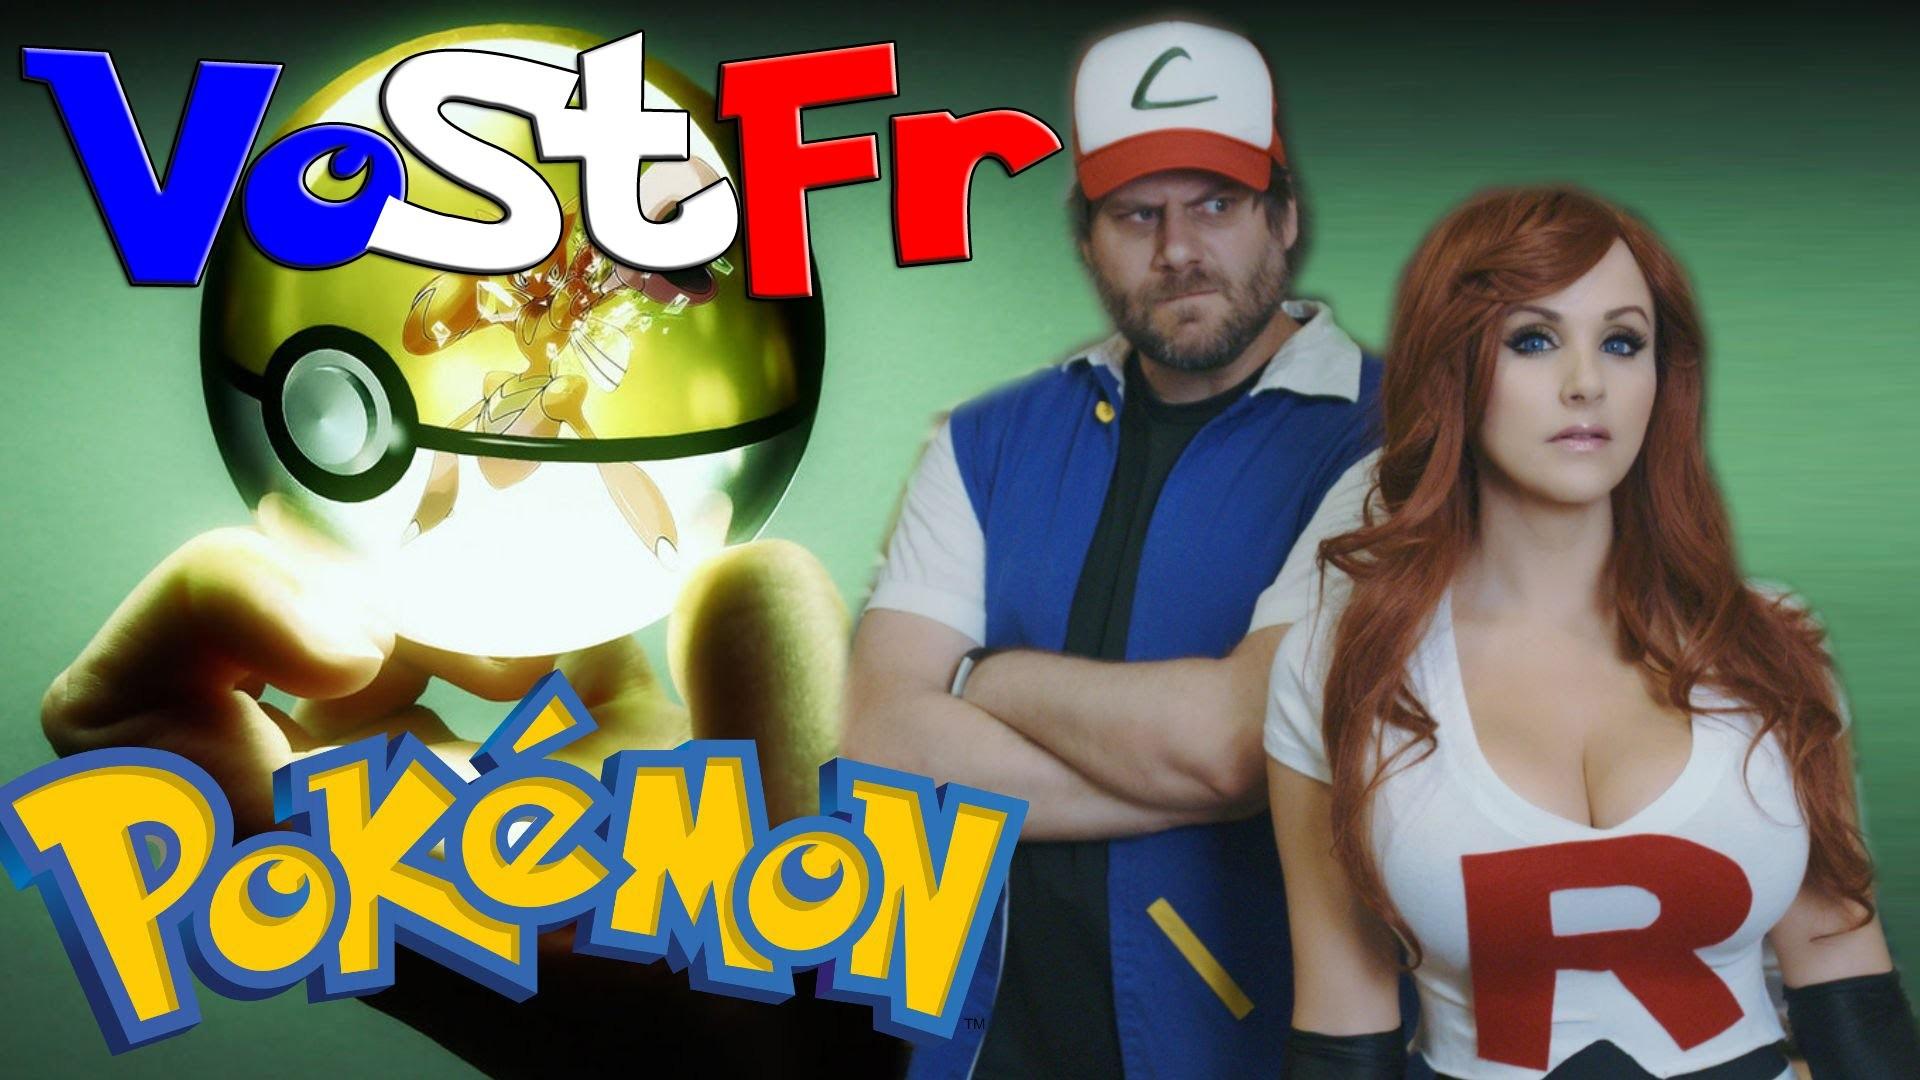 What's Inside A Pokeball? Pokemon Go Ball DIY Tutorial - Nerdcraft VOSTFR